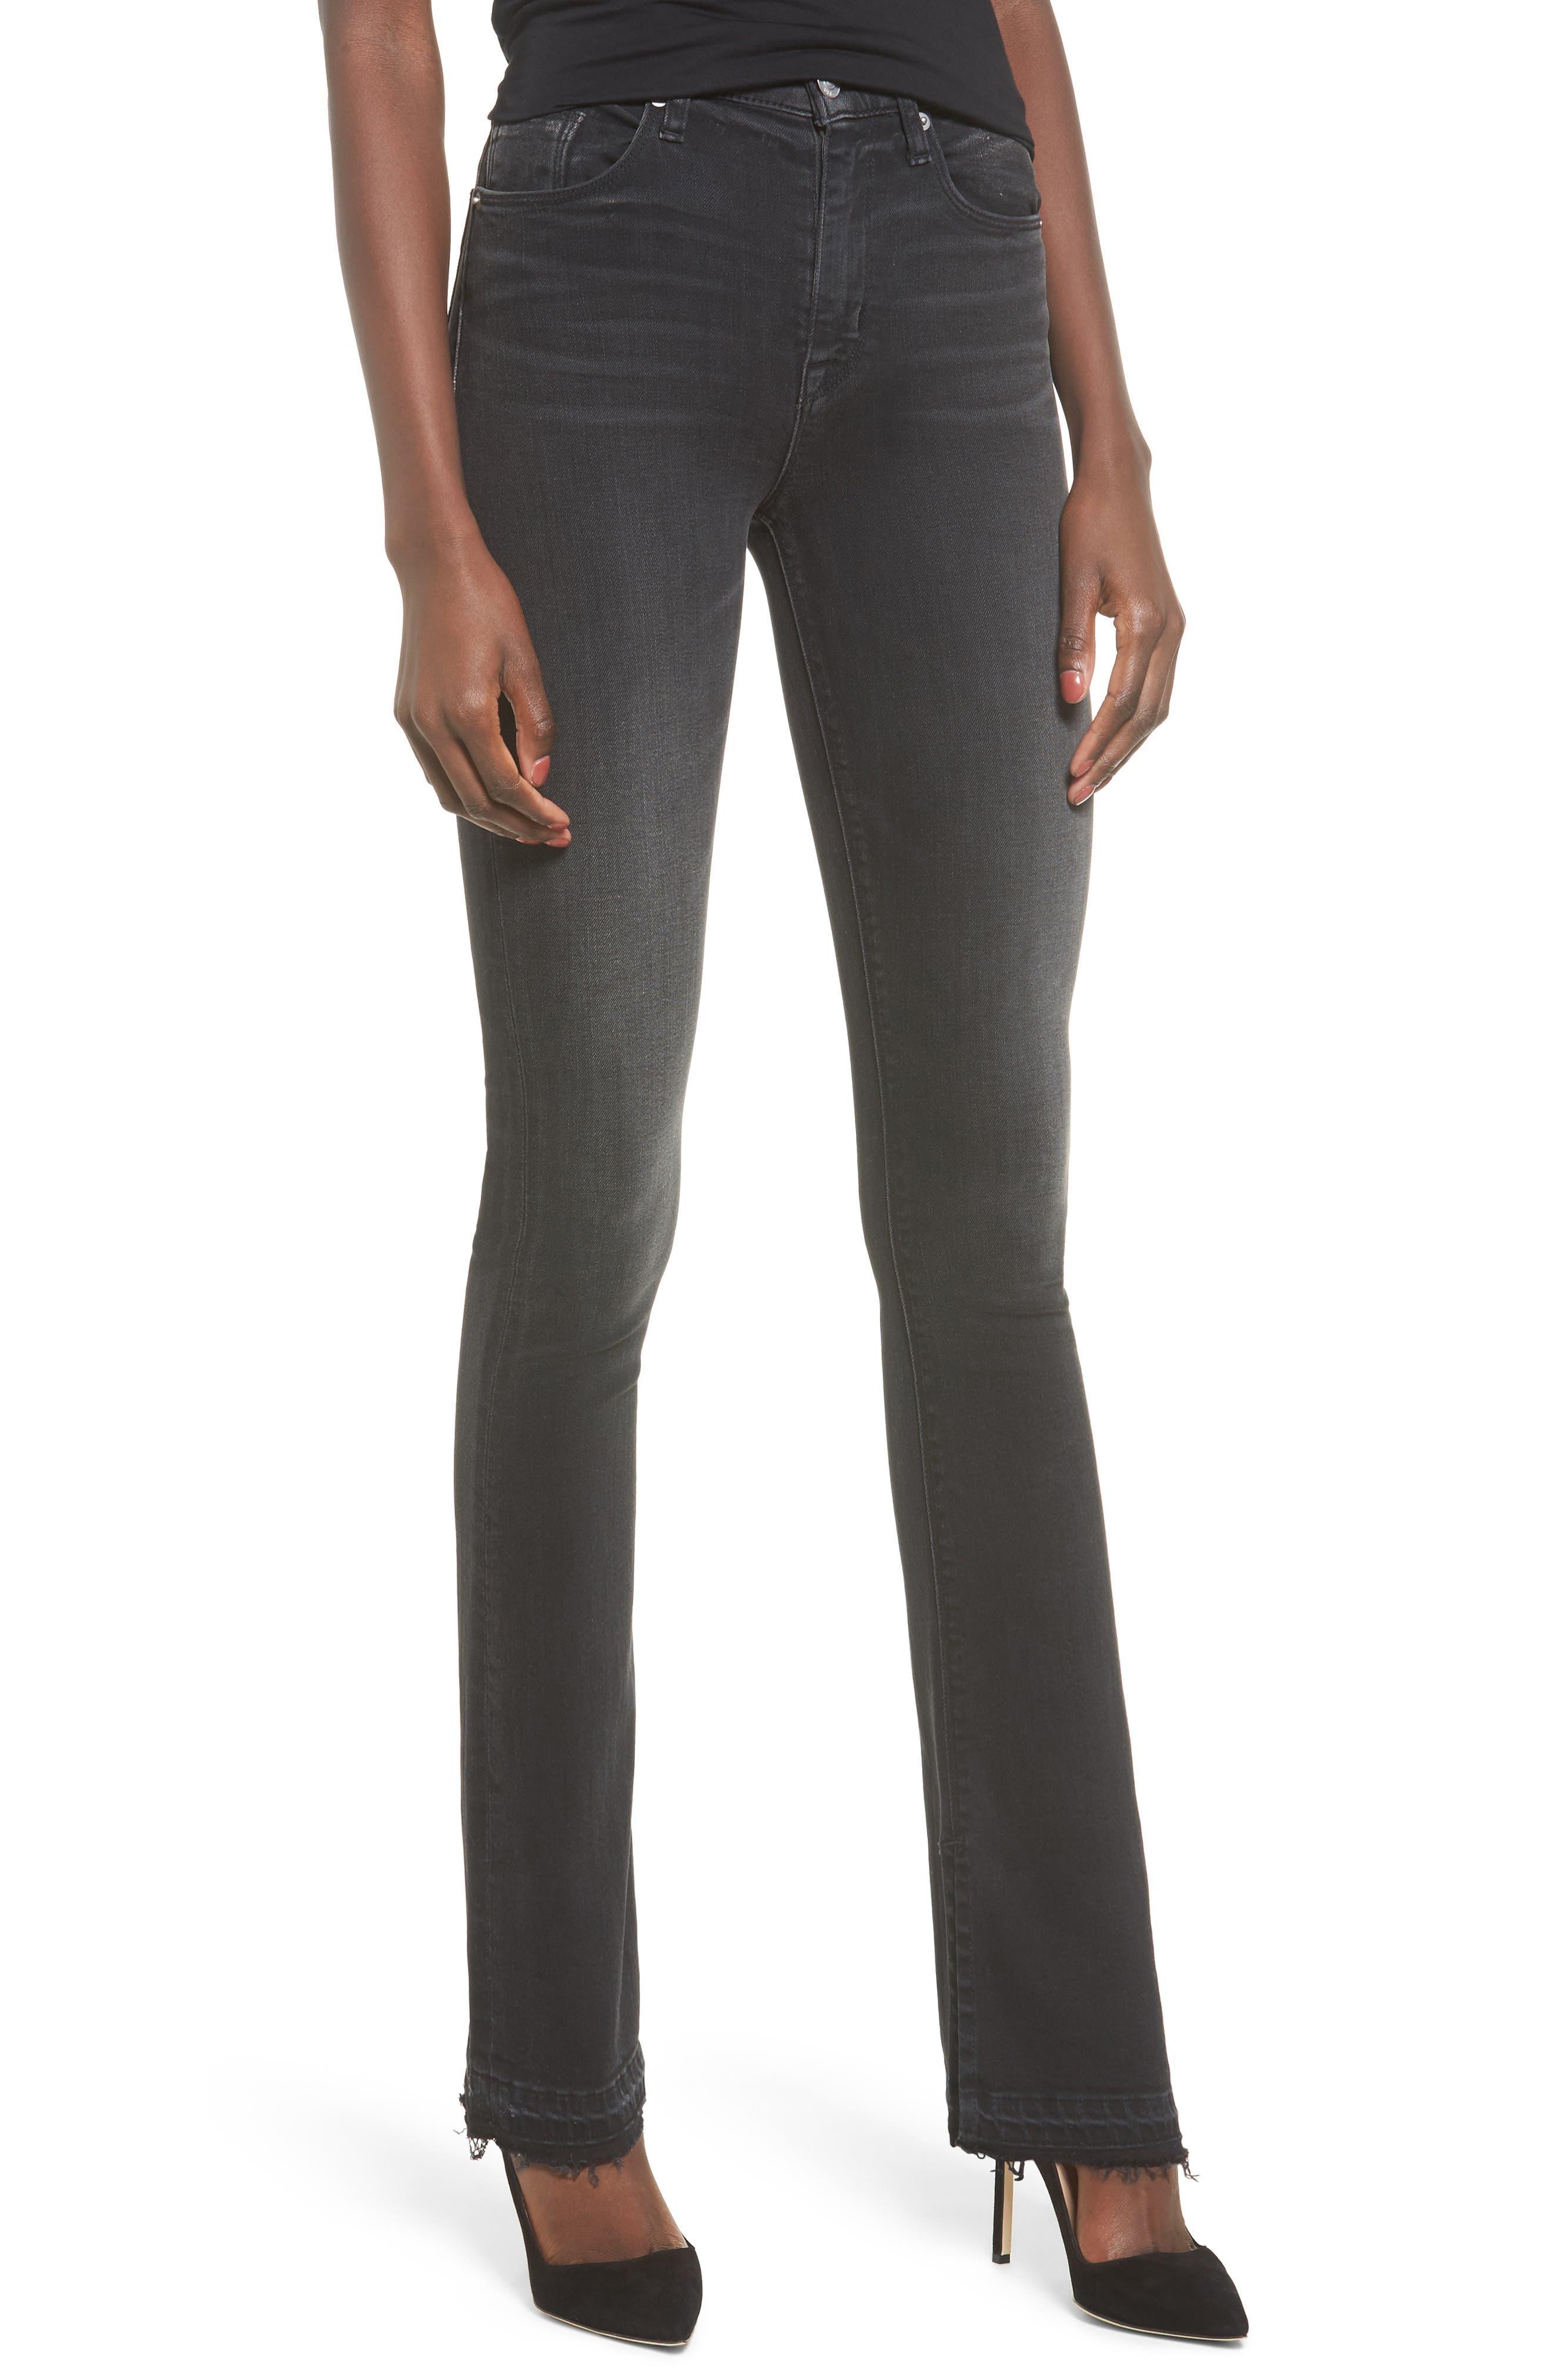 Heartbreaker High Waist Bootcut Jeans,                         Main,                         color,